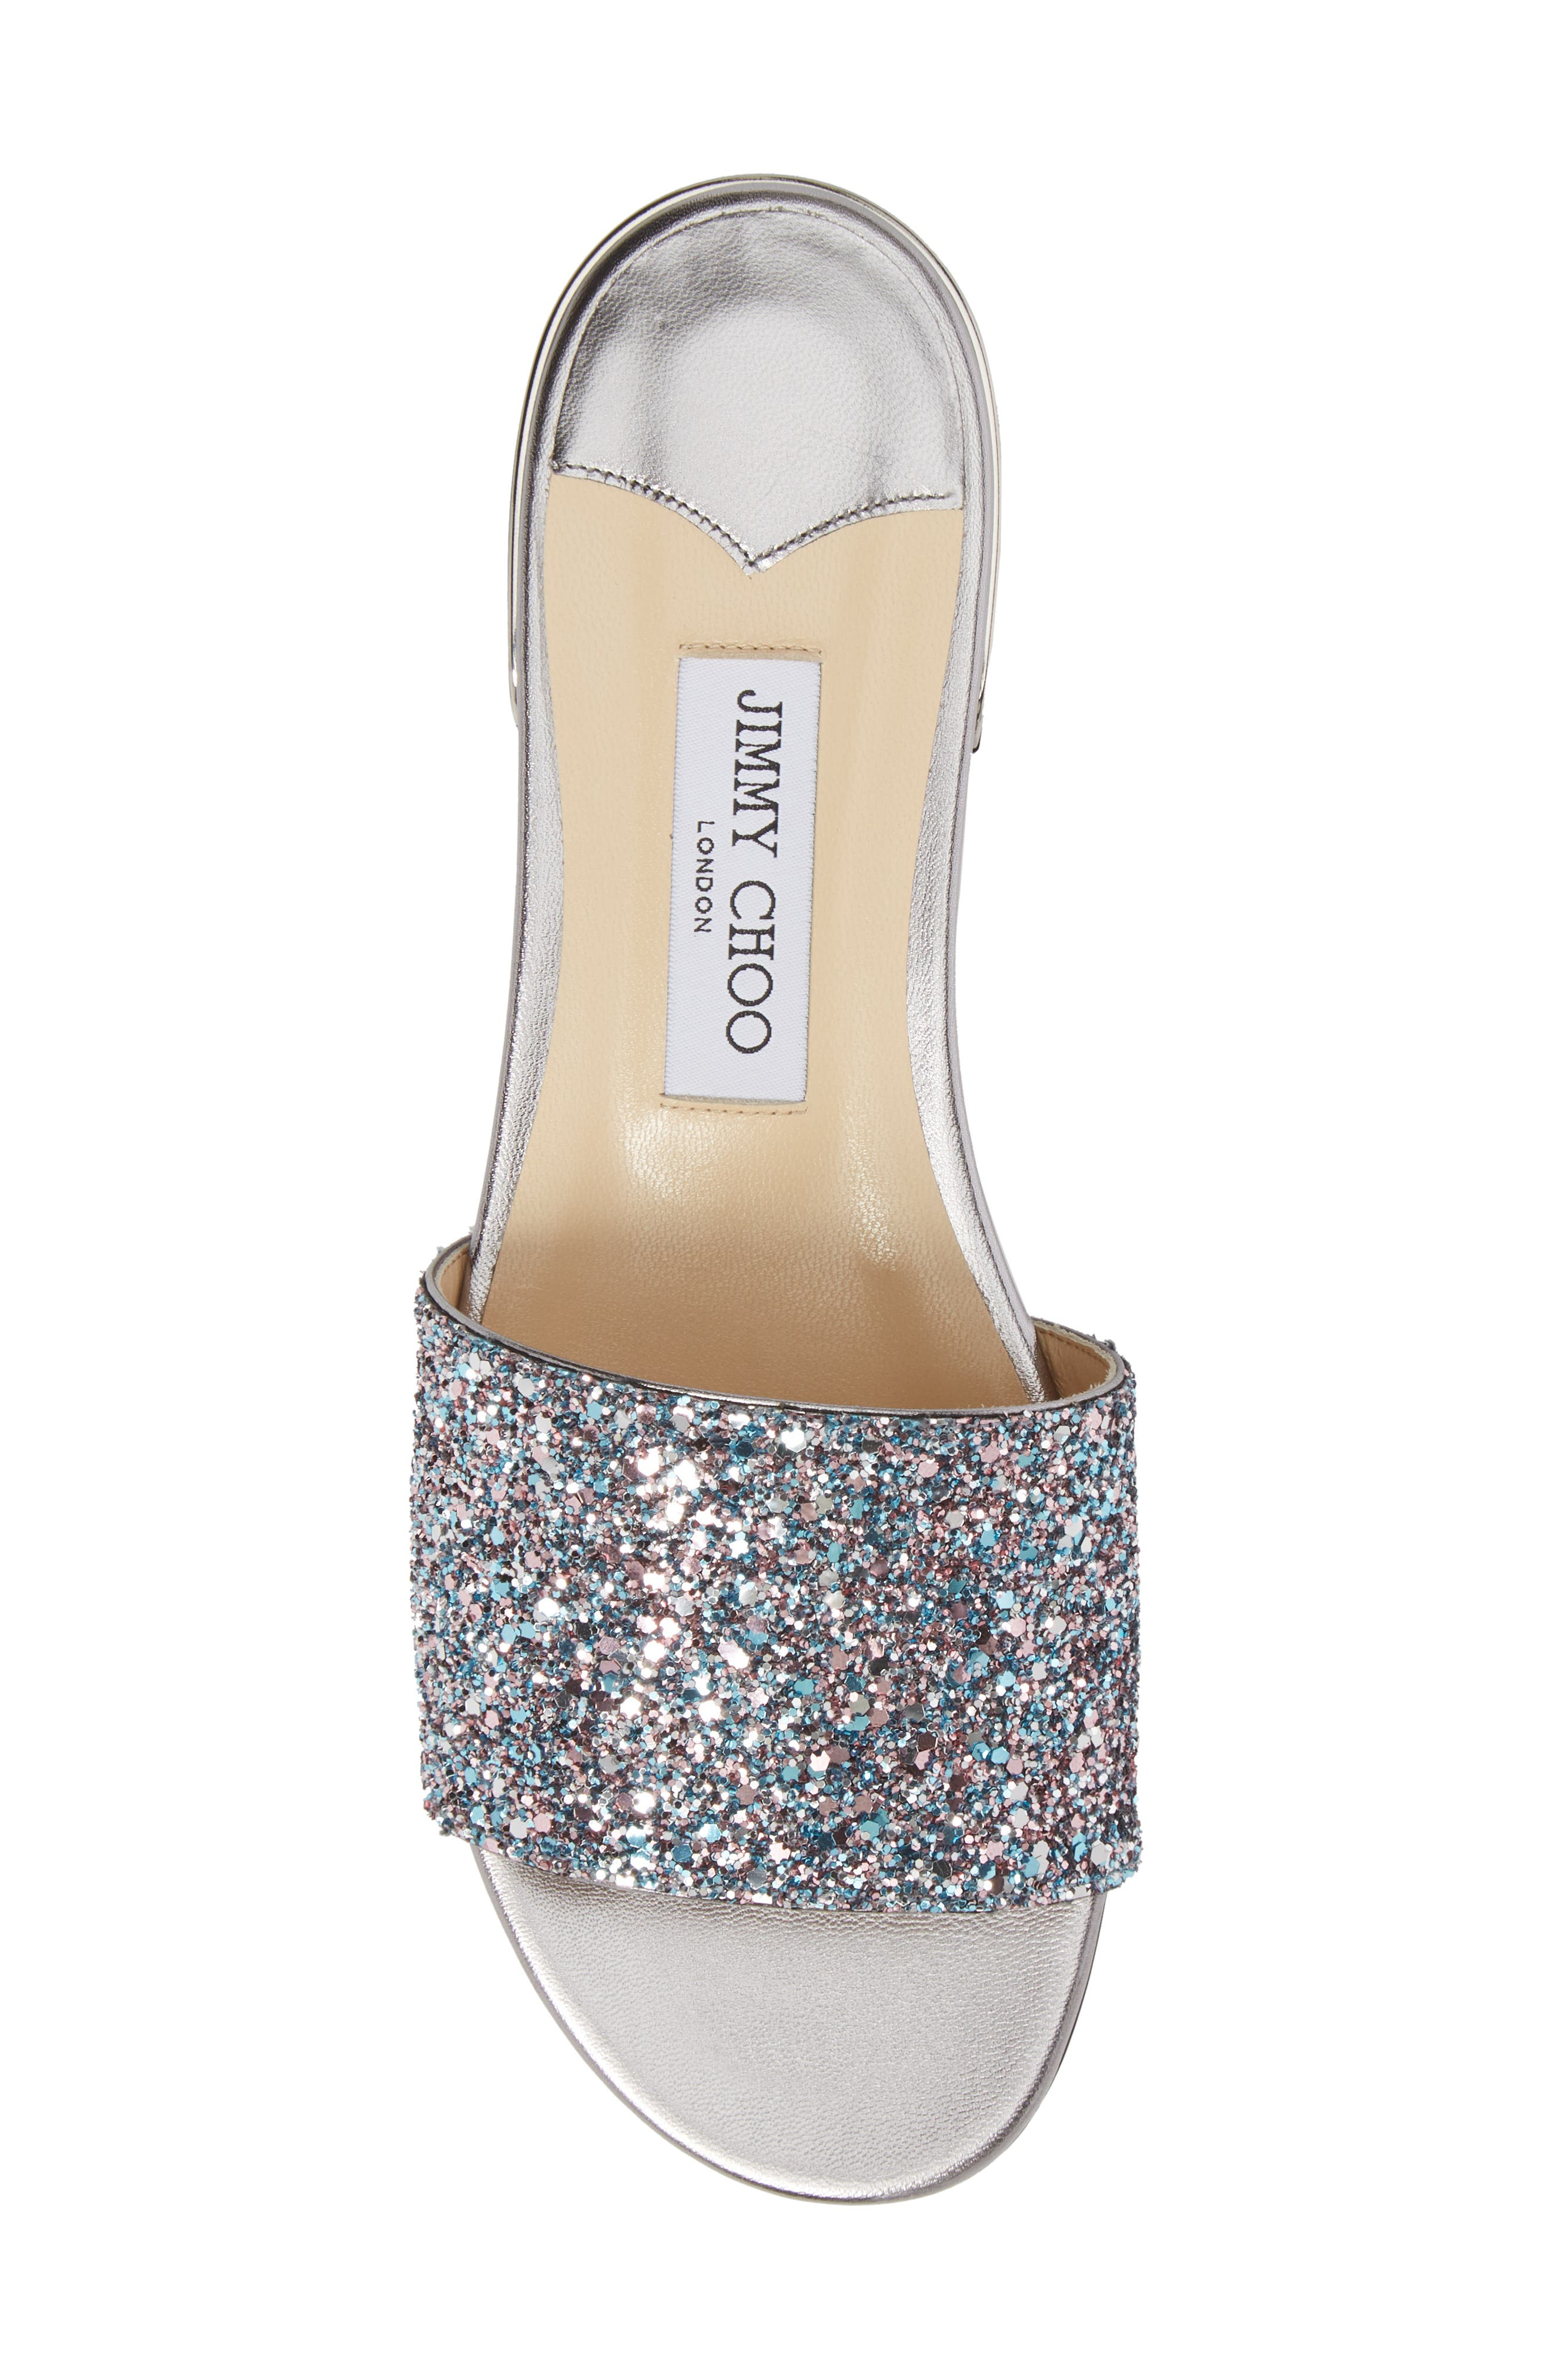 Joni Embellished Slide Sandal,                             Alternate thumbnail 5, color,                             Blush Silver